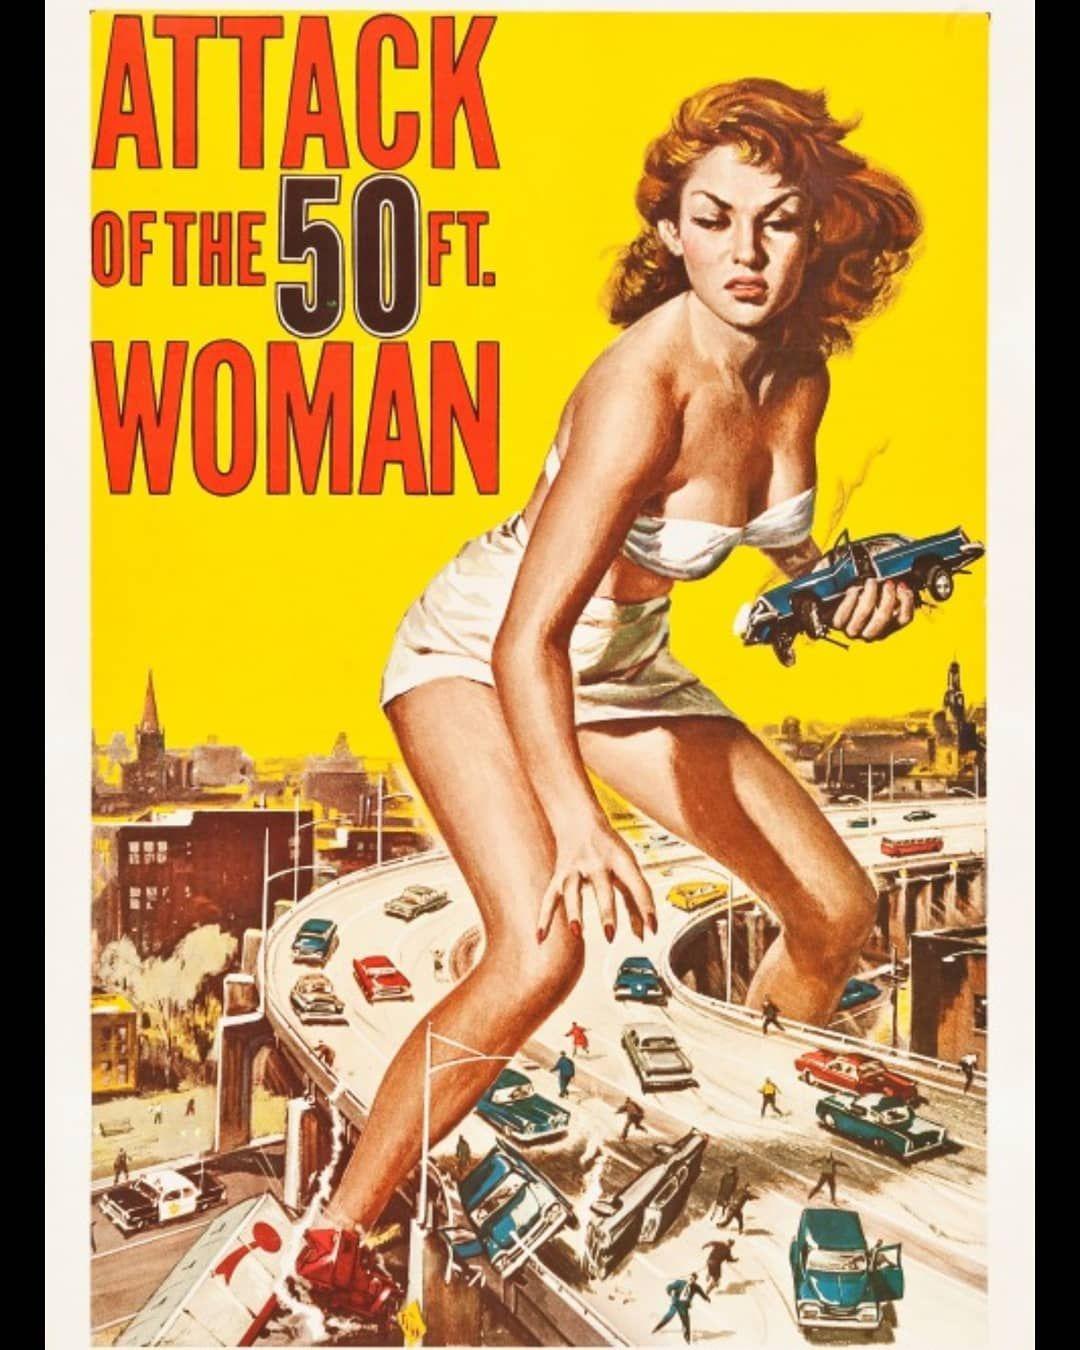 Reelkewlmovieposters Film Movie Movies Horror Scifi Poster Posters Artwork Artworks Horrormovie Horrormovies 70s 60s 90s 80s Poster Film Poster Pulp Fiction